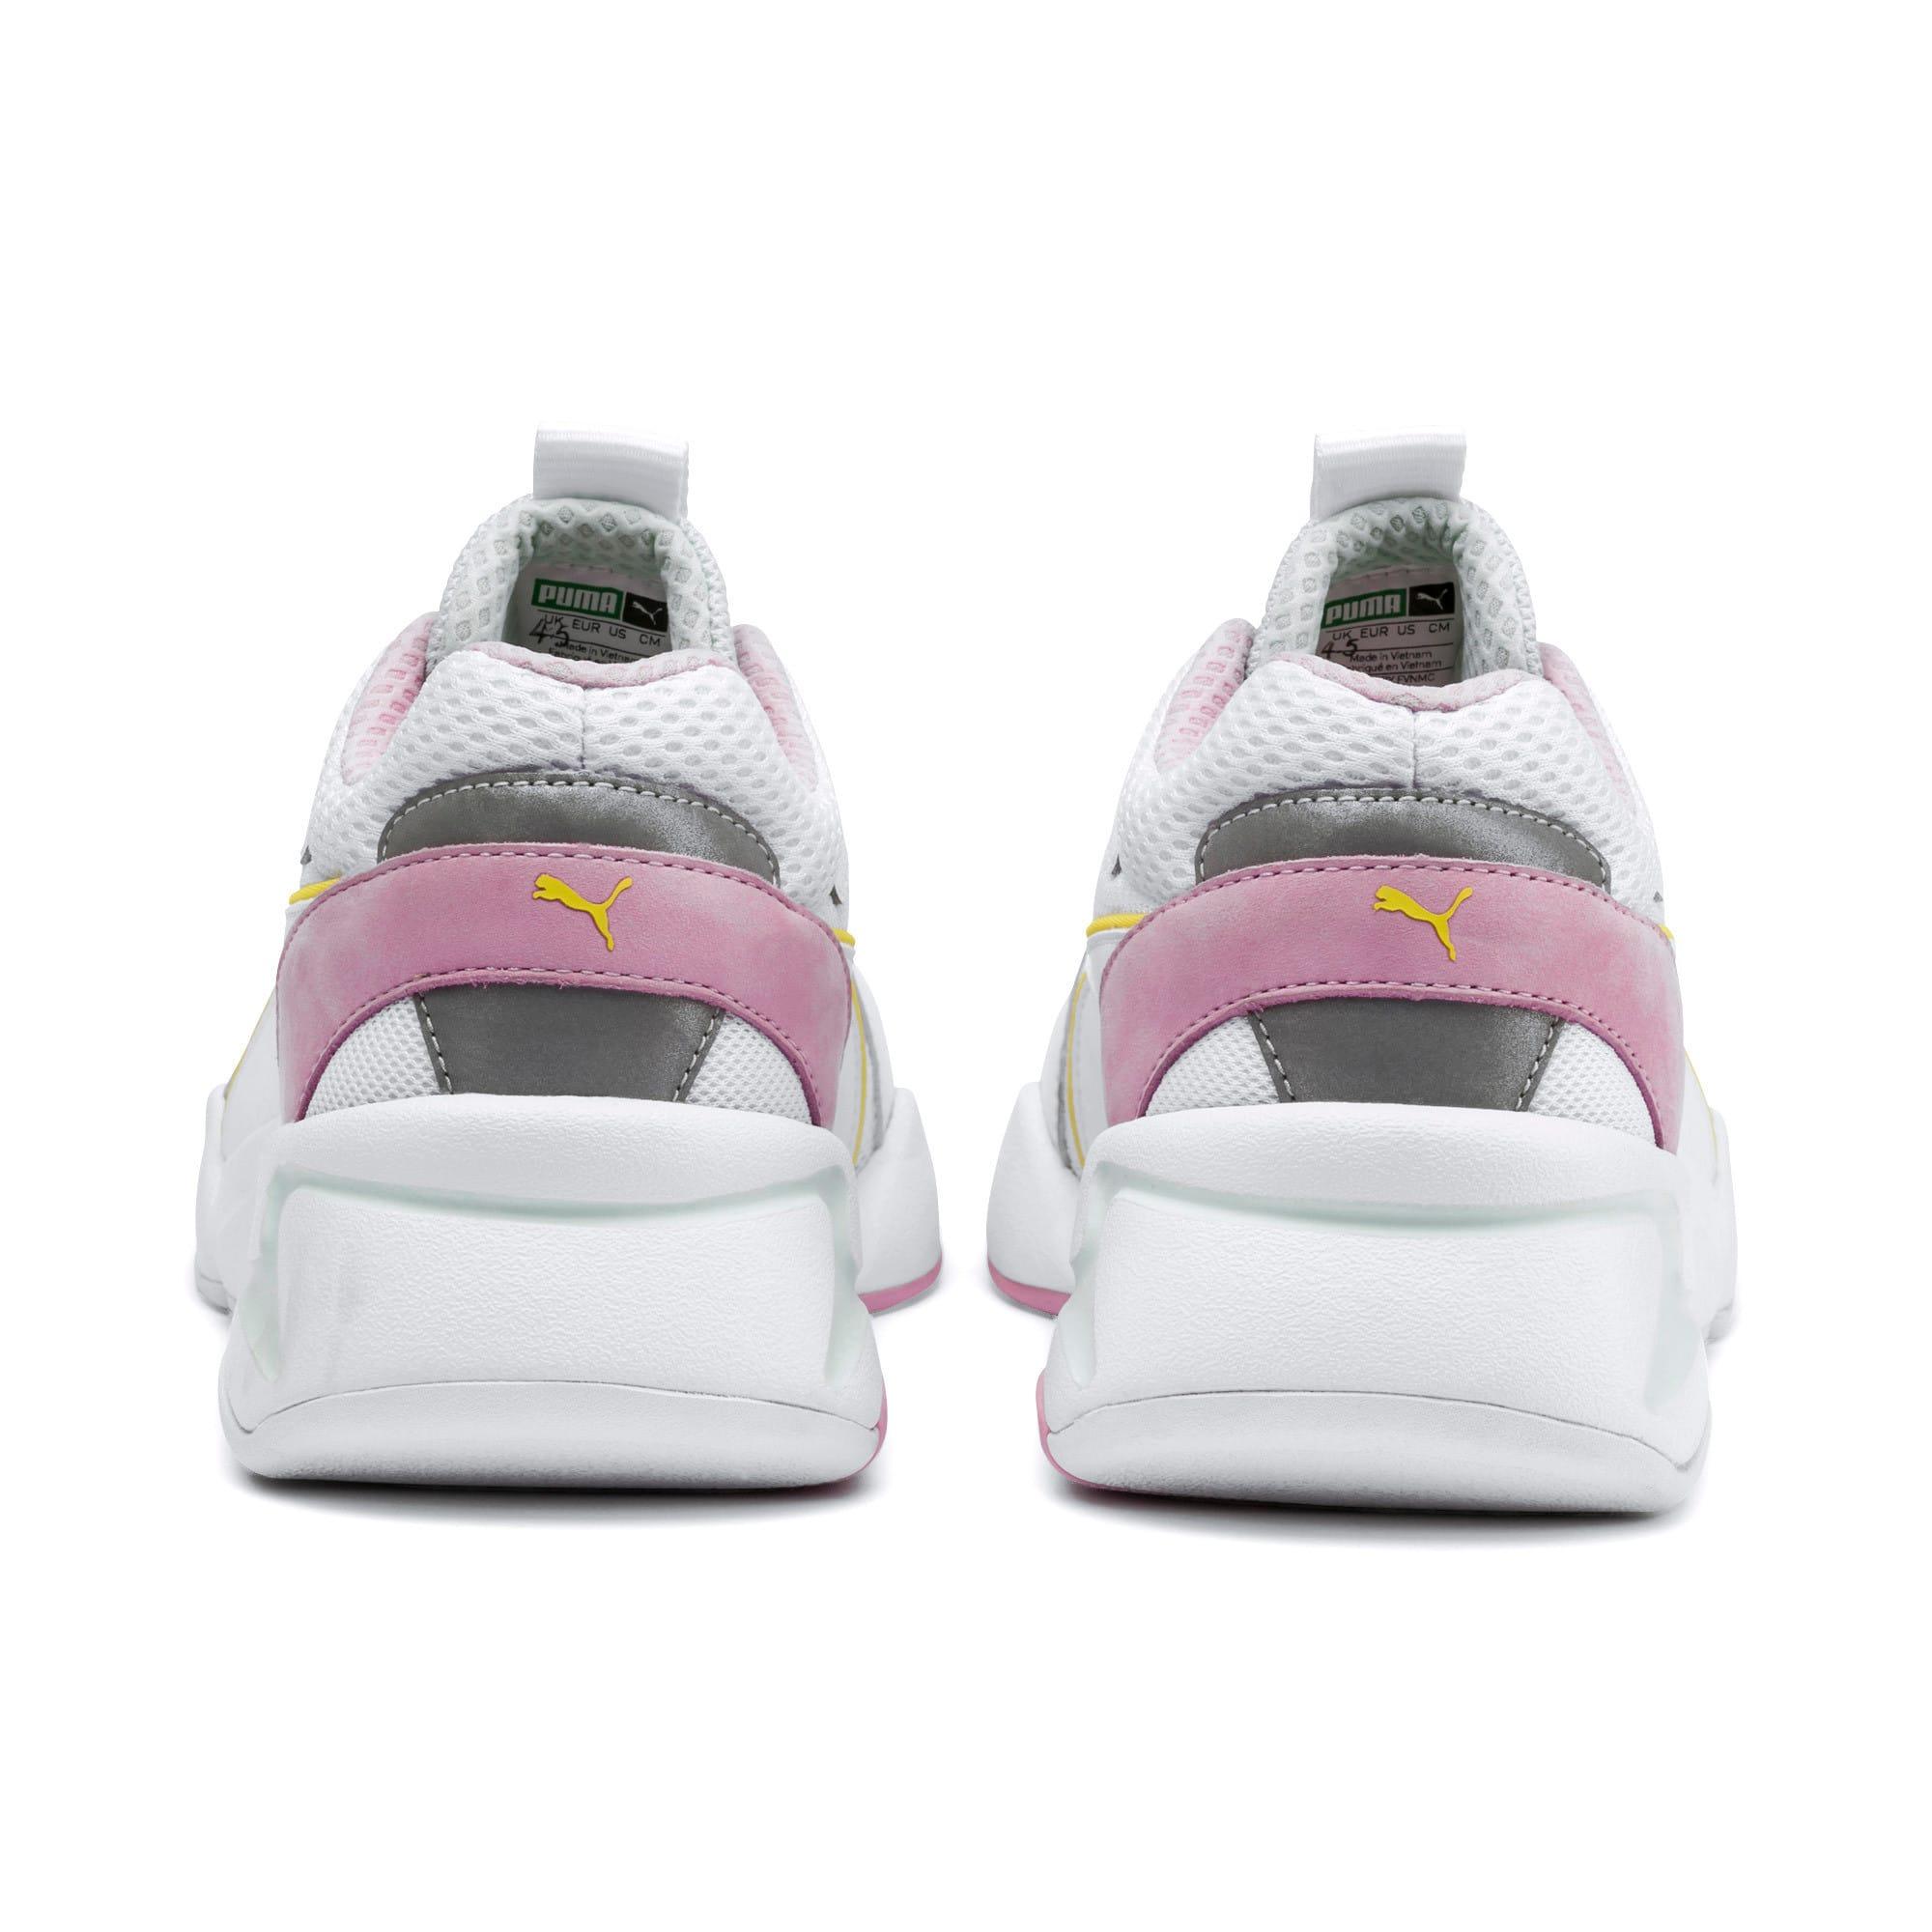 Thumbnail 4 of Nova Mesh Women's Sneakers, Puma White-Fair Aqua, medium